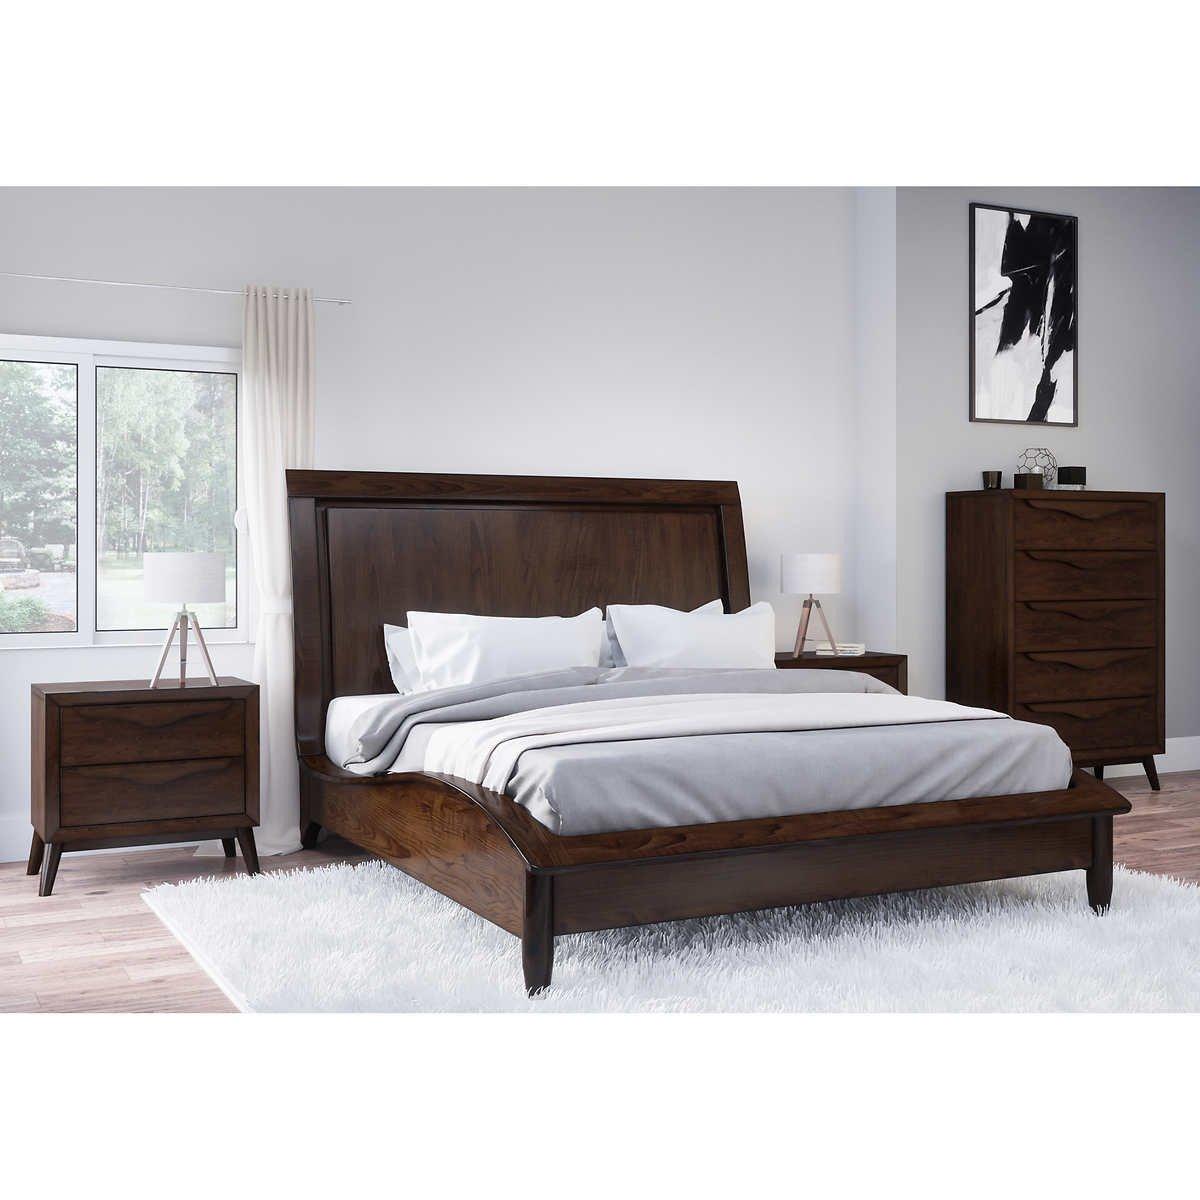 Costco Bedroom Furniture Reviews Lovely Bransen 4 Piece King Bedroom Set